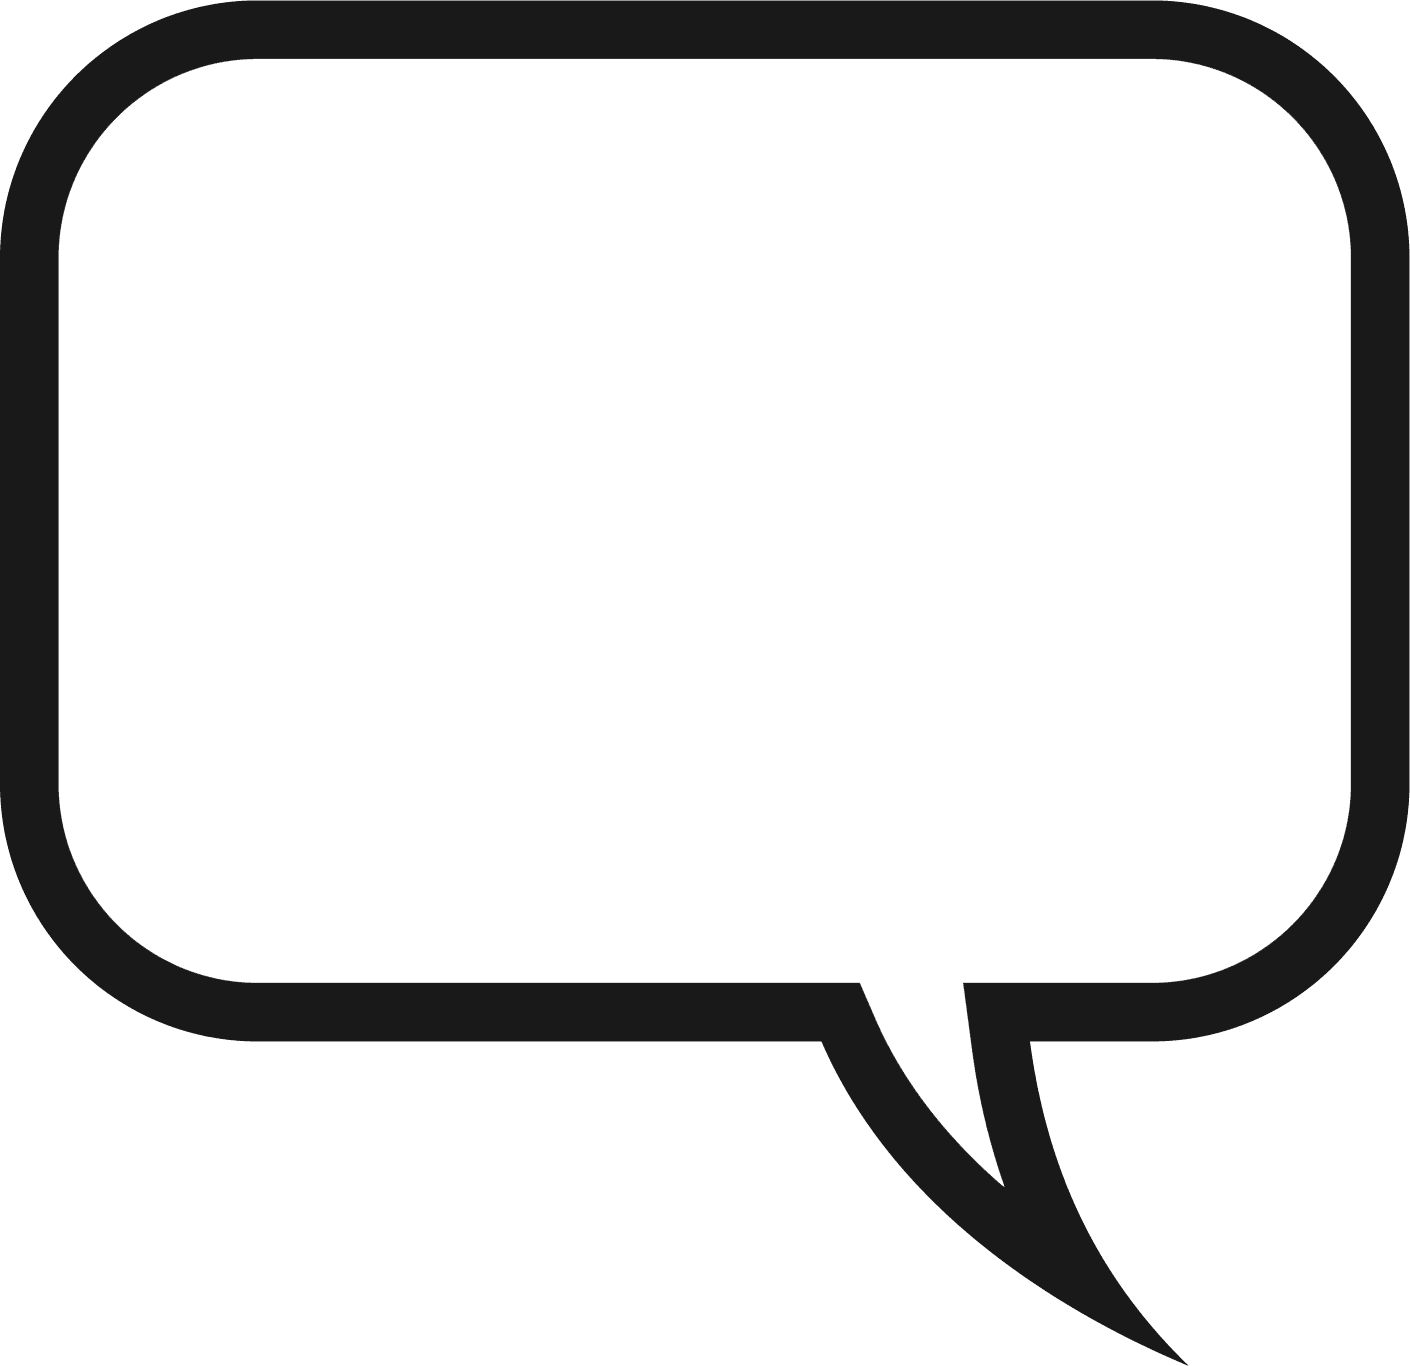 1410x1366 Thought Bubble Word Bubble Speech Clip Art Free Clipart Image